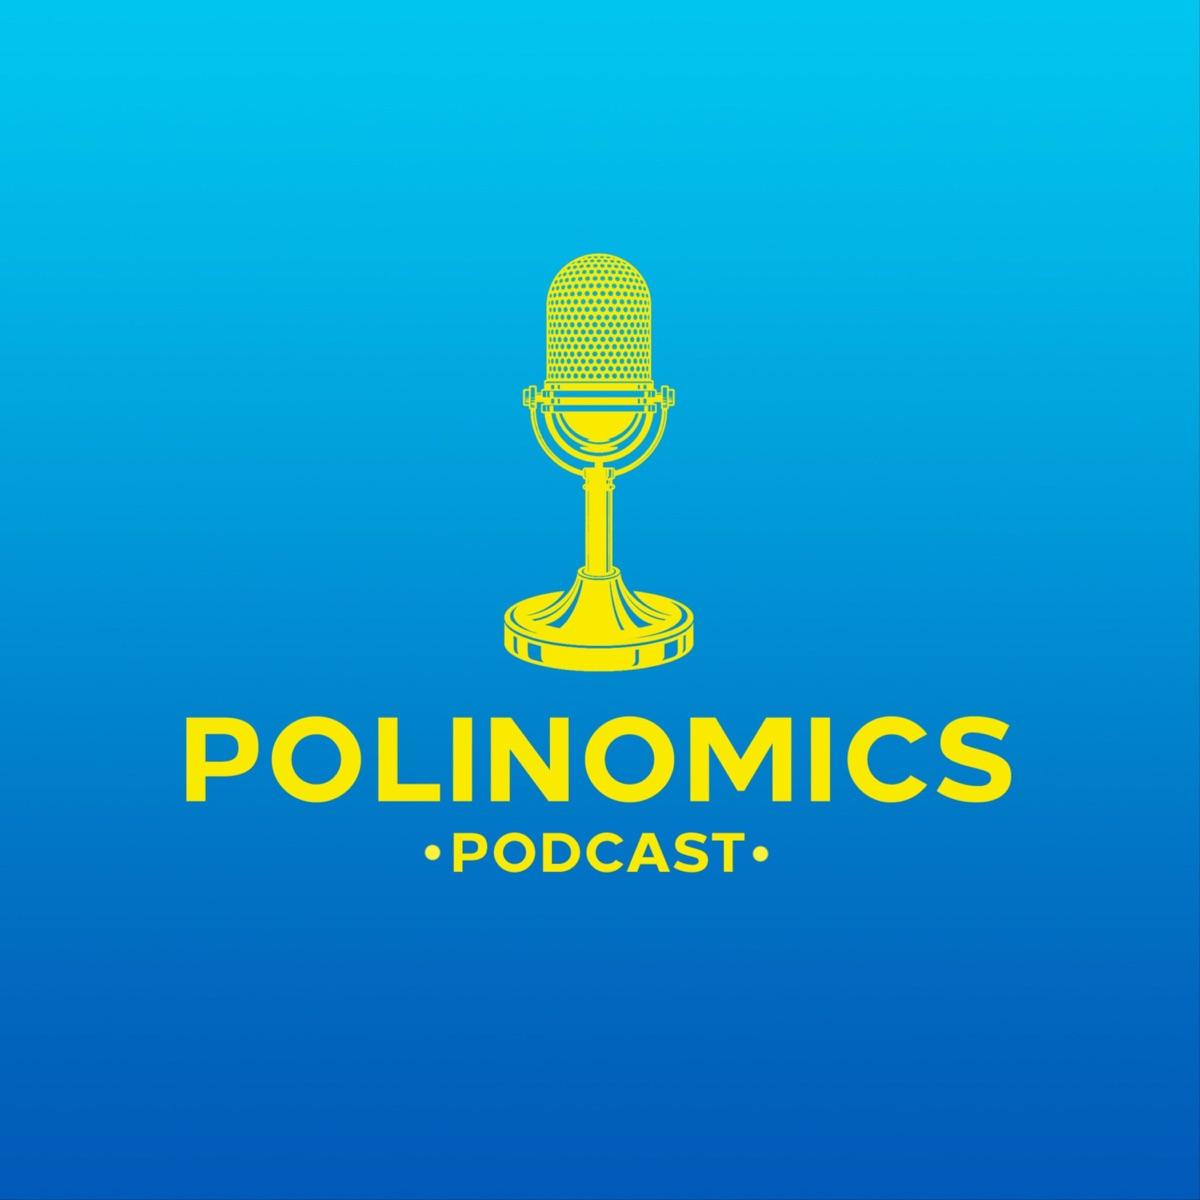 Polinomics